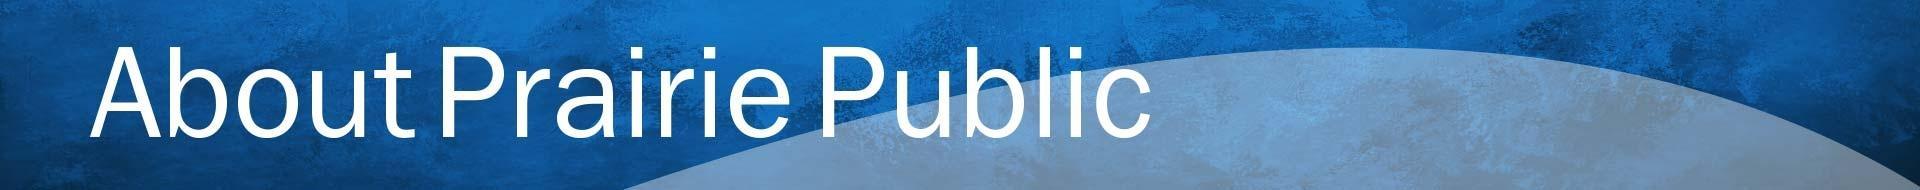 About Prairie Public